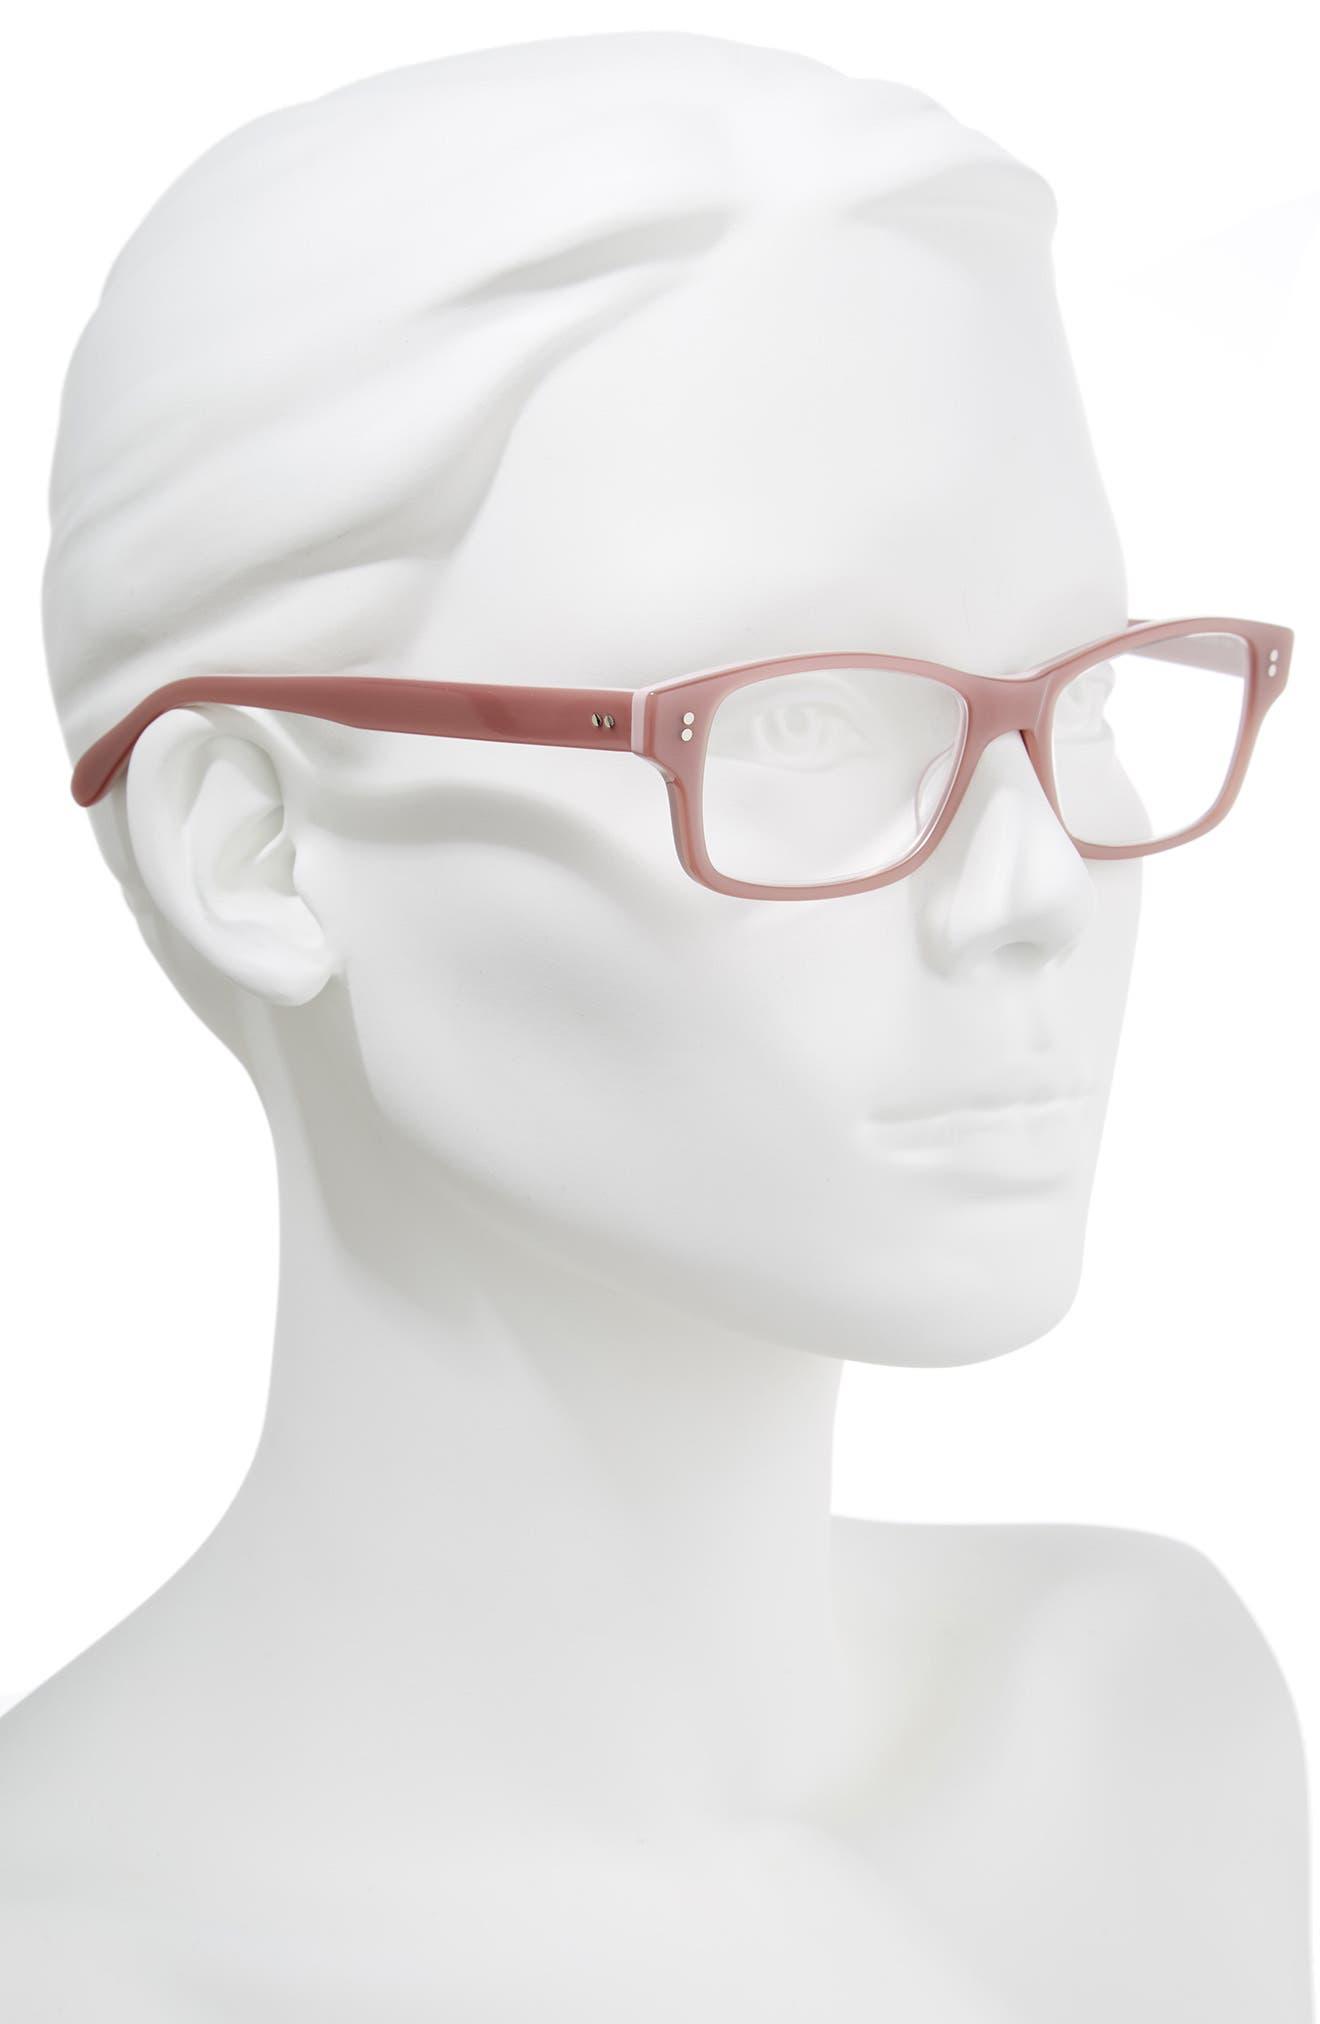 'Jess' 52mm Reading Glasses,                             Alternate thumbnail 2, color,                             Pink